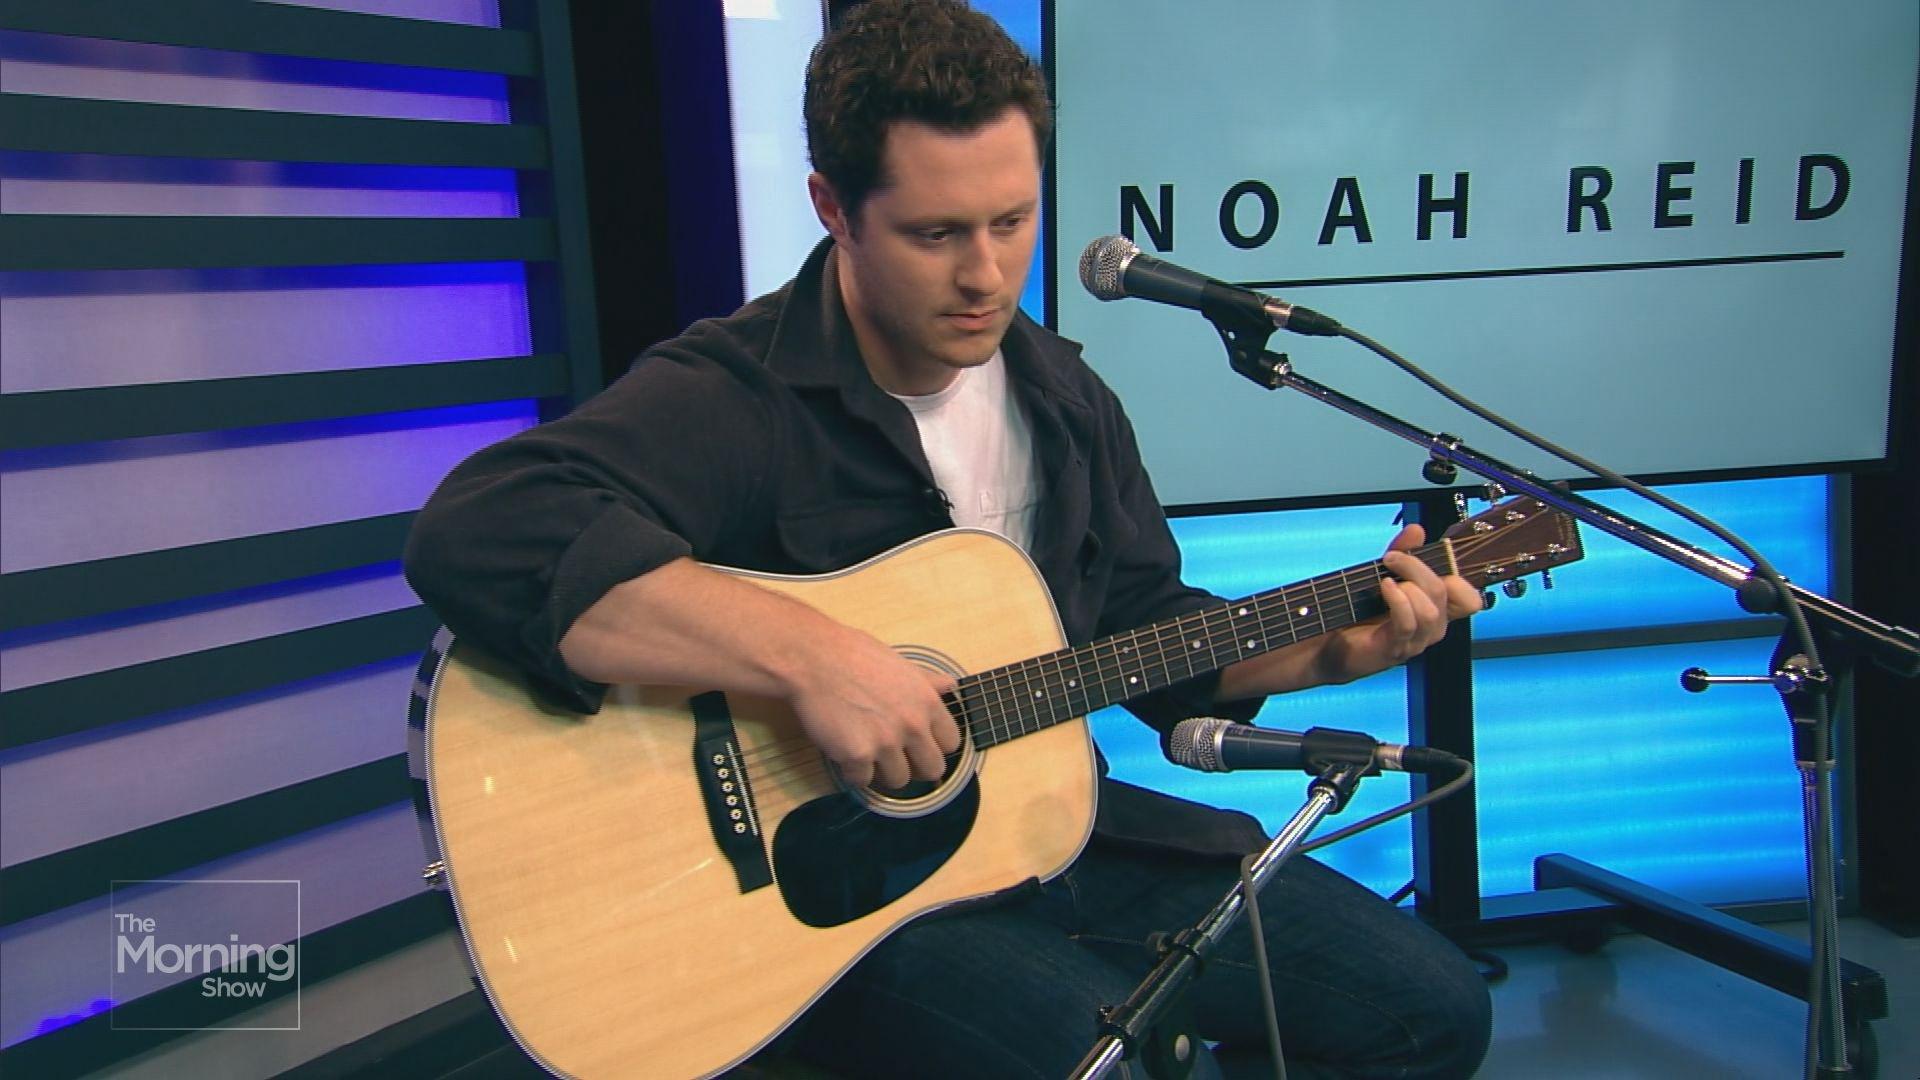 Schitt's Creek star Noah Reid performs 'Jacob's Dream'